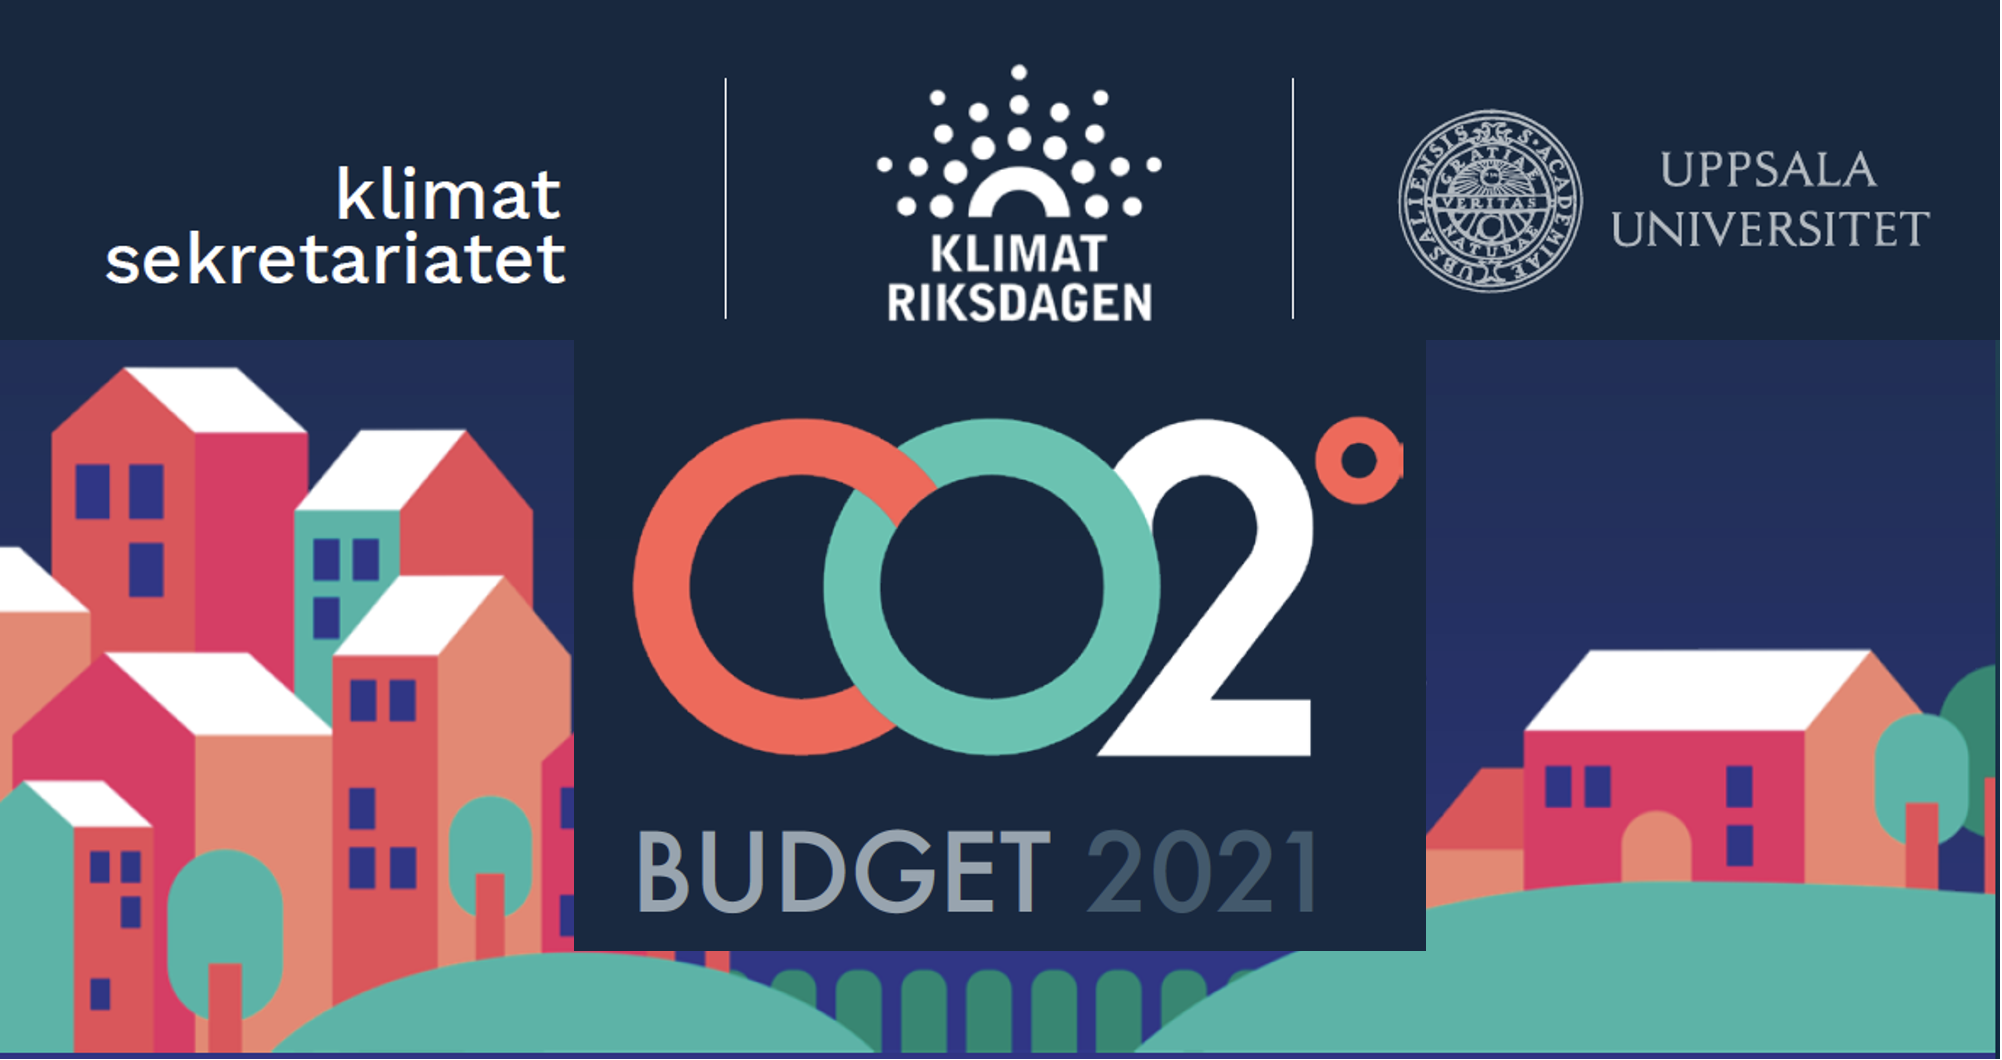 Klimat sekretariatet, Klimat Riksdagen, Uppsala Universitet - CO2 Budget 2021